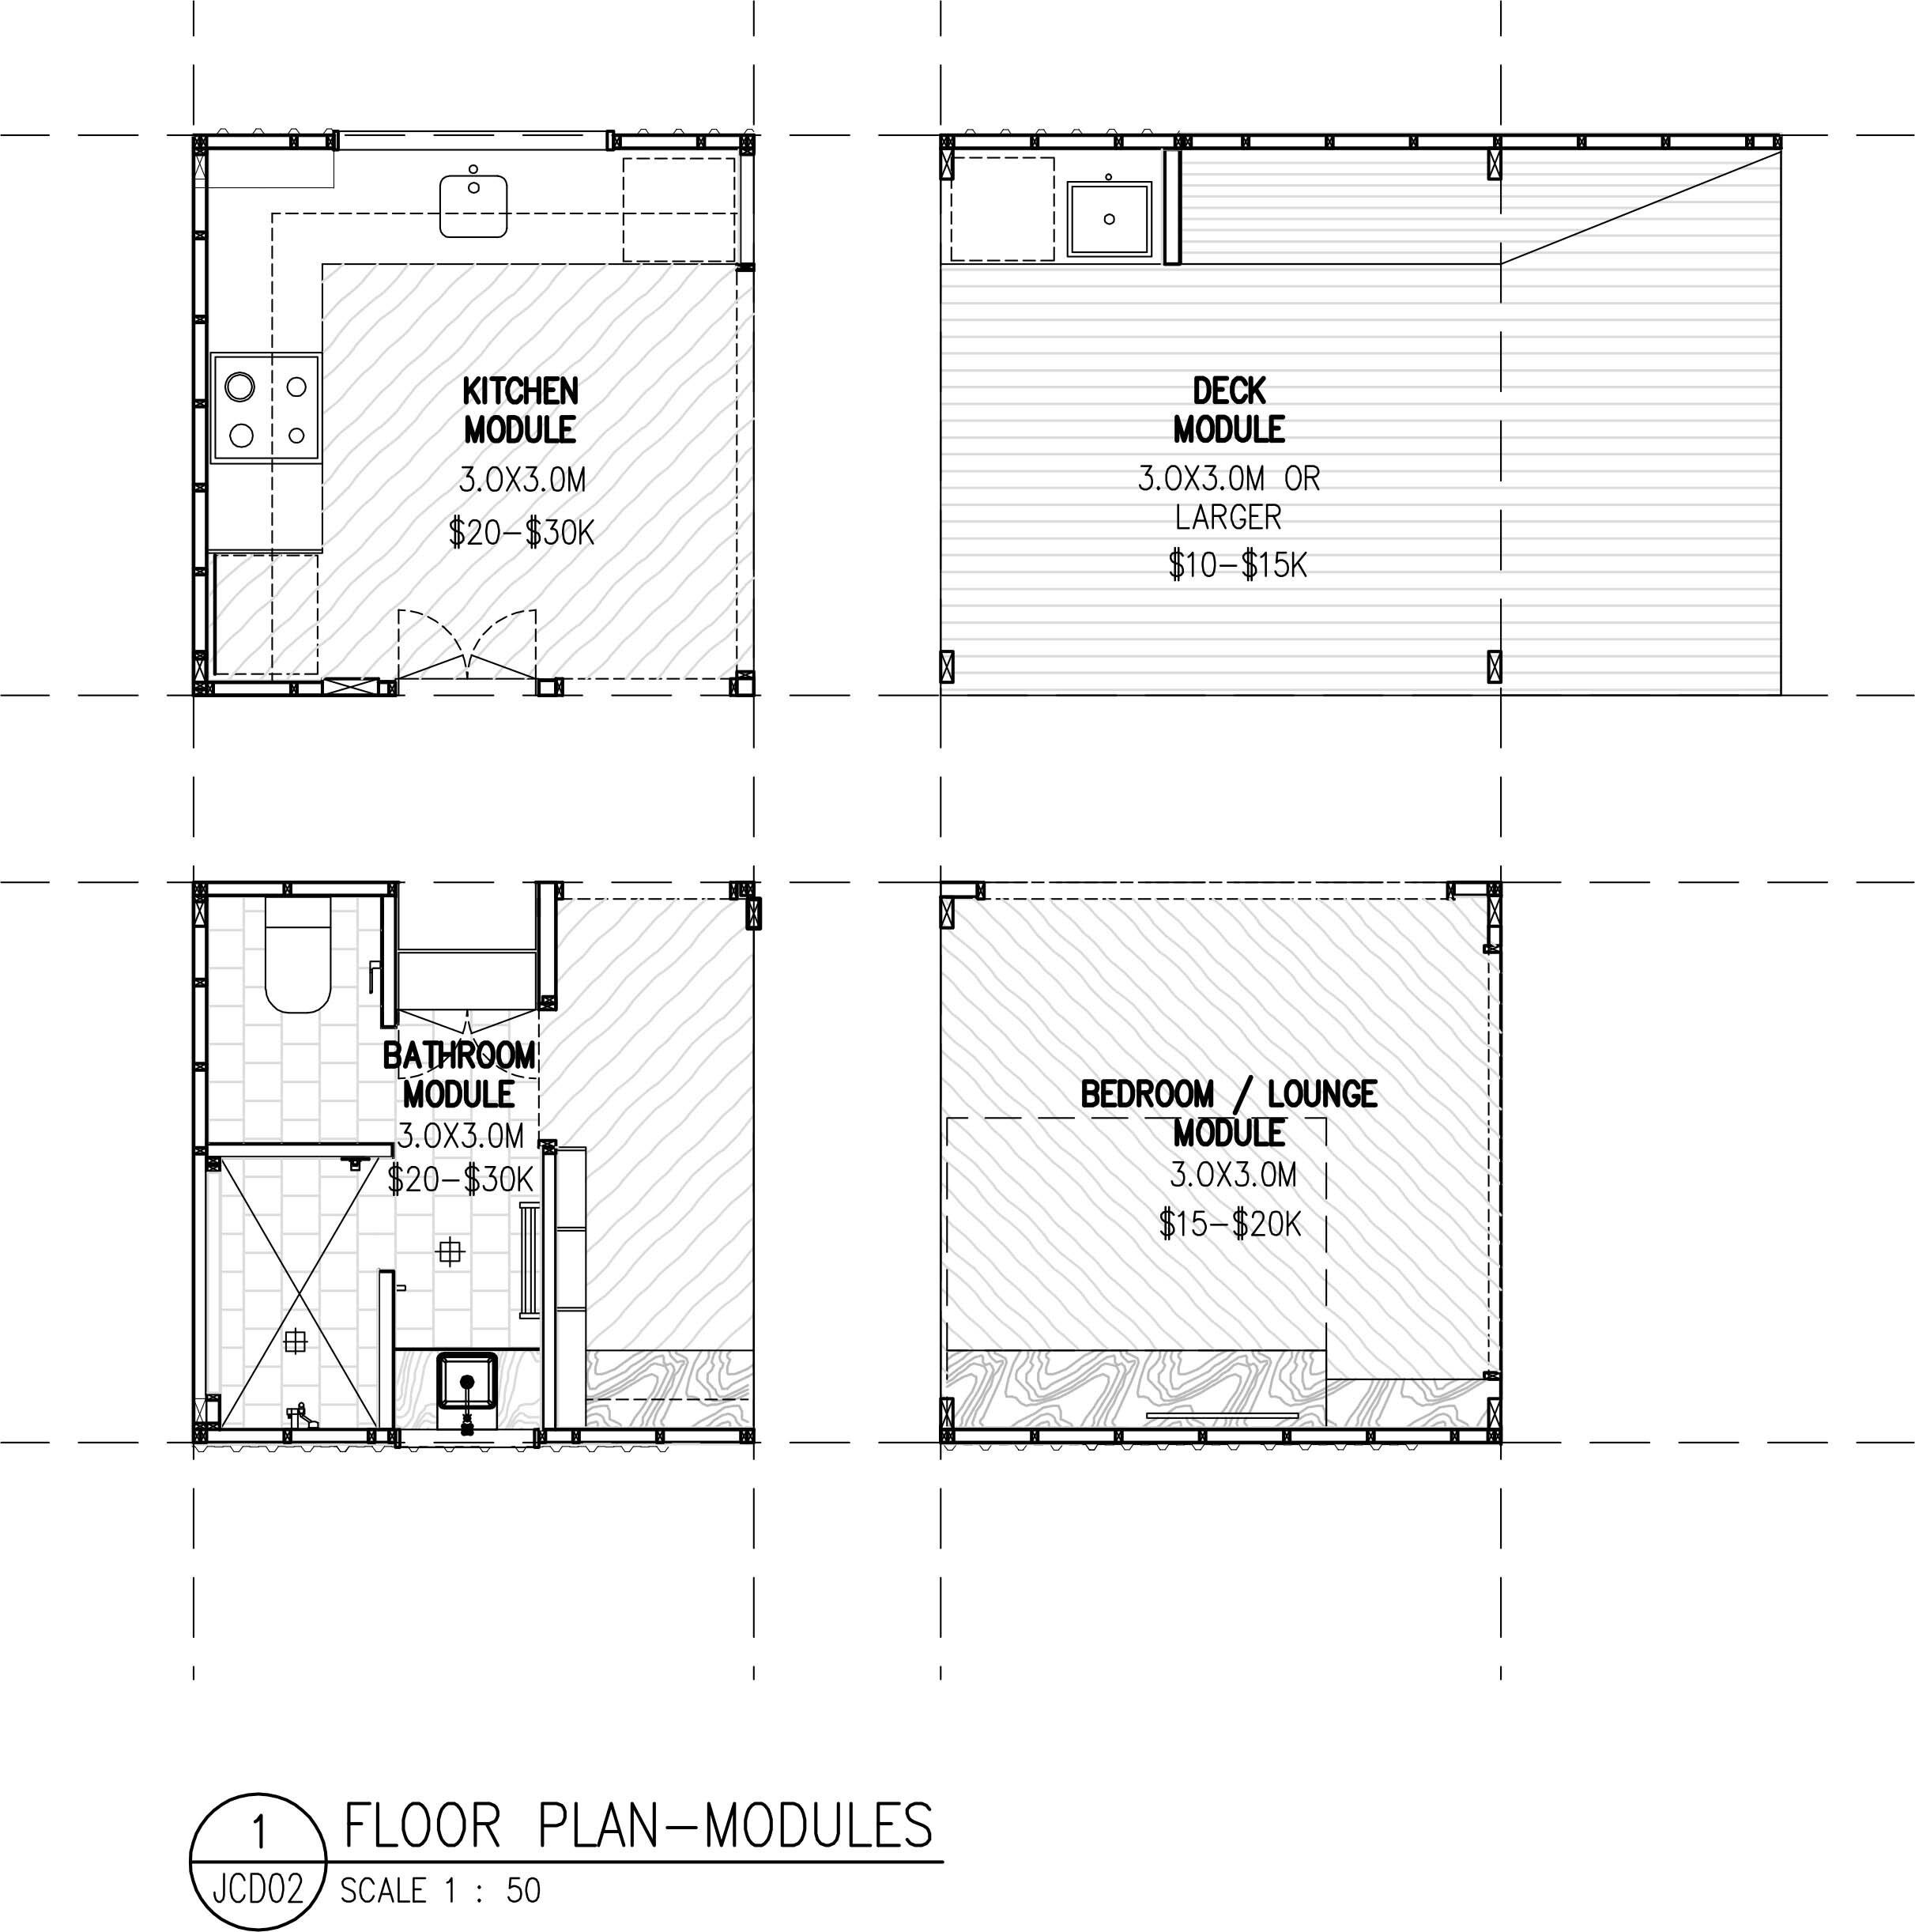 house PLANS MODULES.jpg